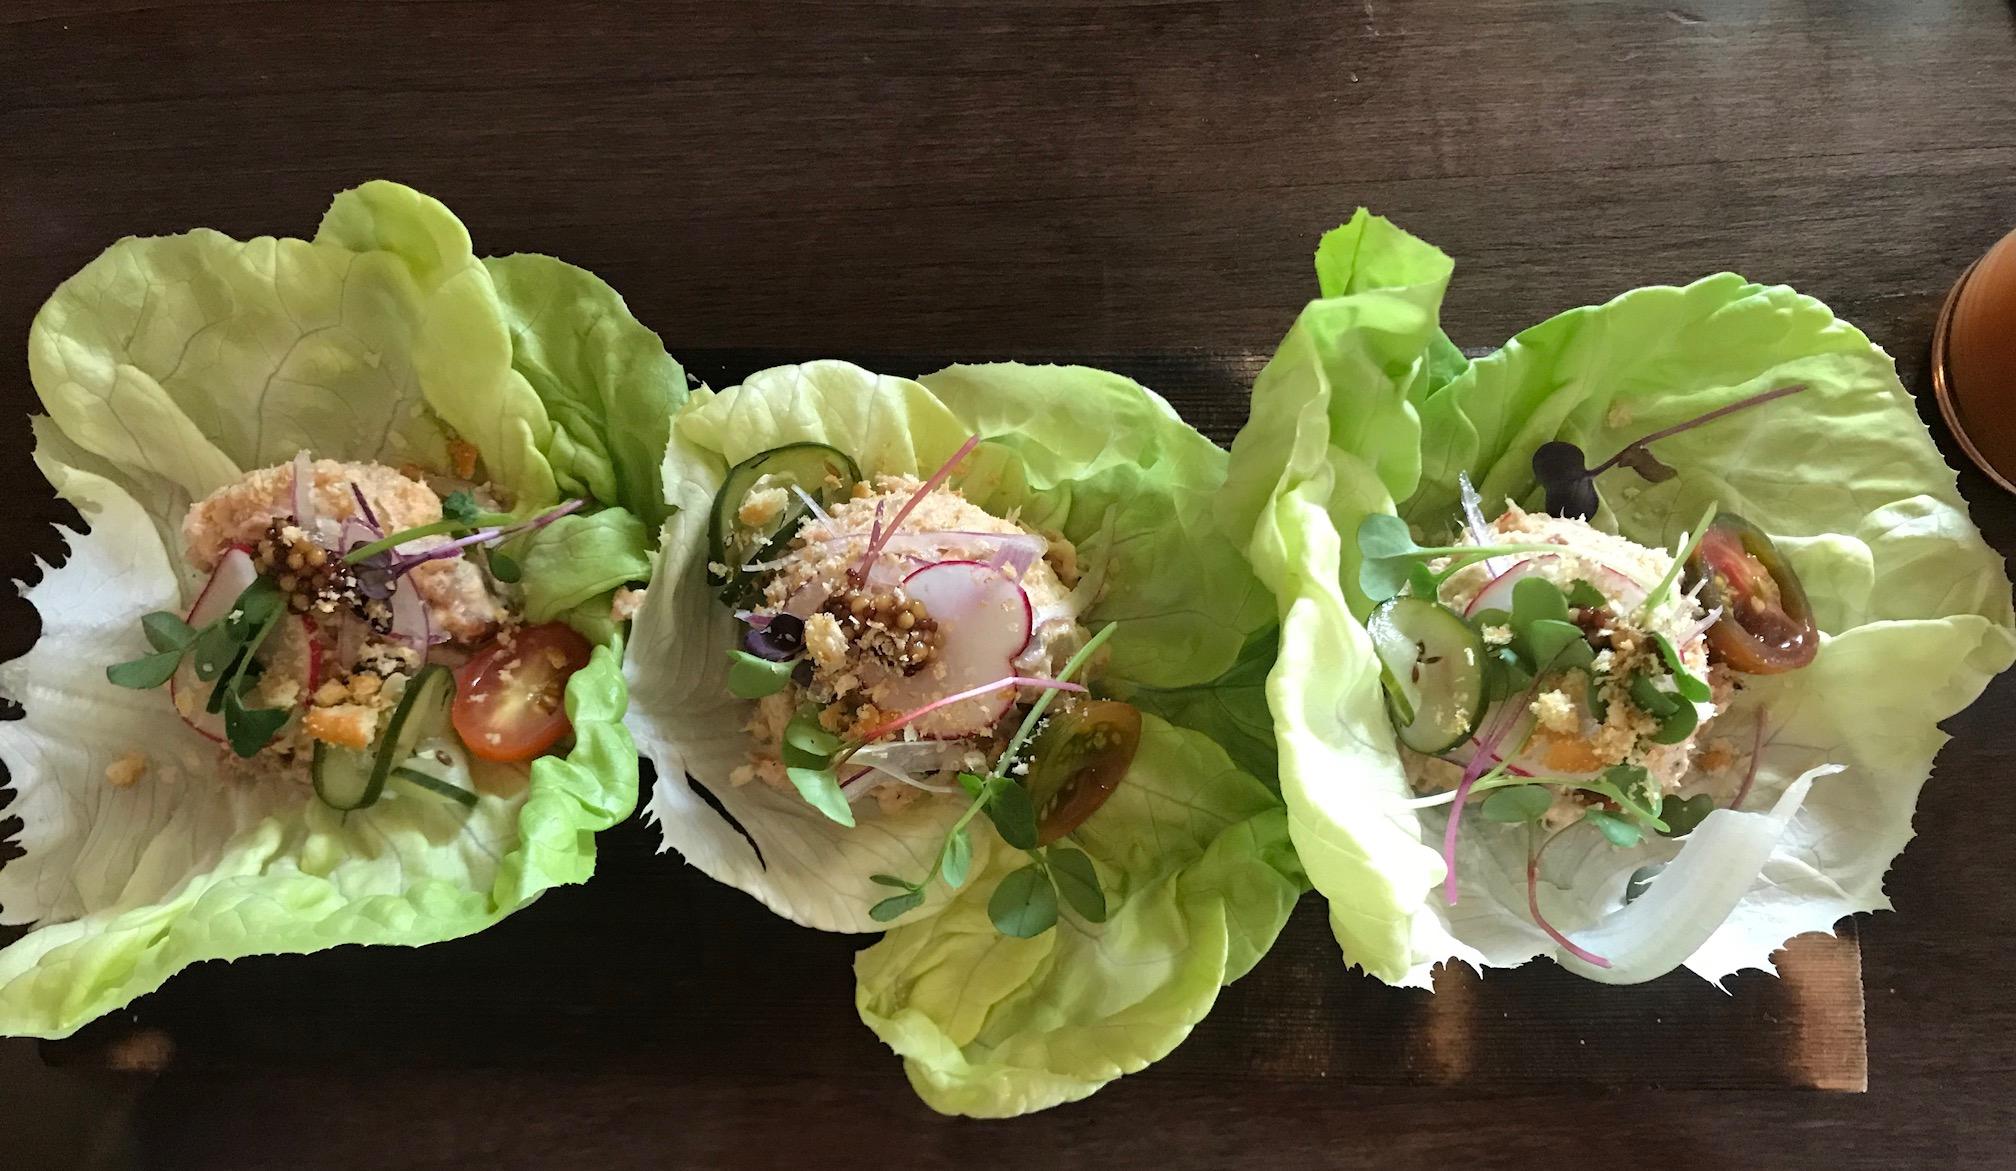 Gilbert's Hot Chicken, Fish + Shrimp, Gilbert's Hot Chicken in Jacksonville, Gilbert's Kitchen Jax Beach, Jacksonville Restaurant Review